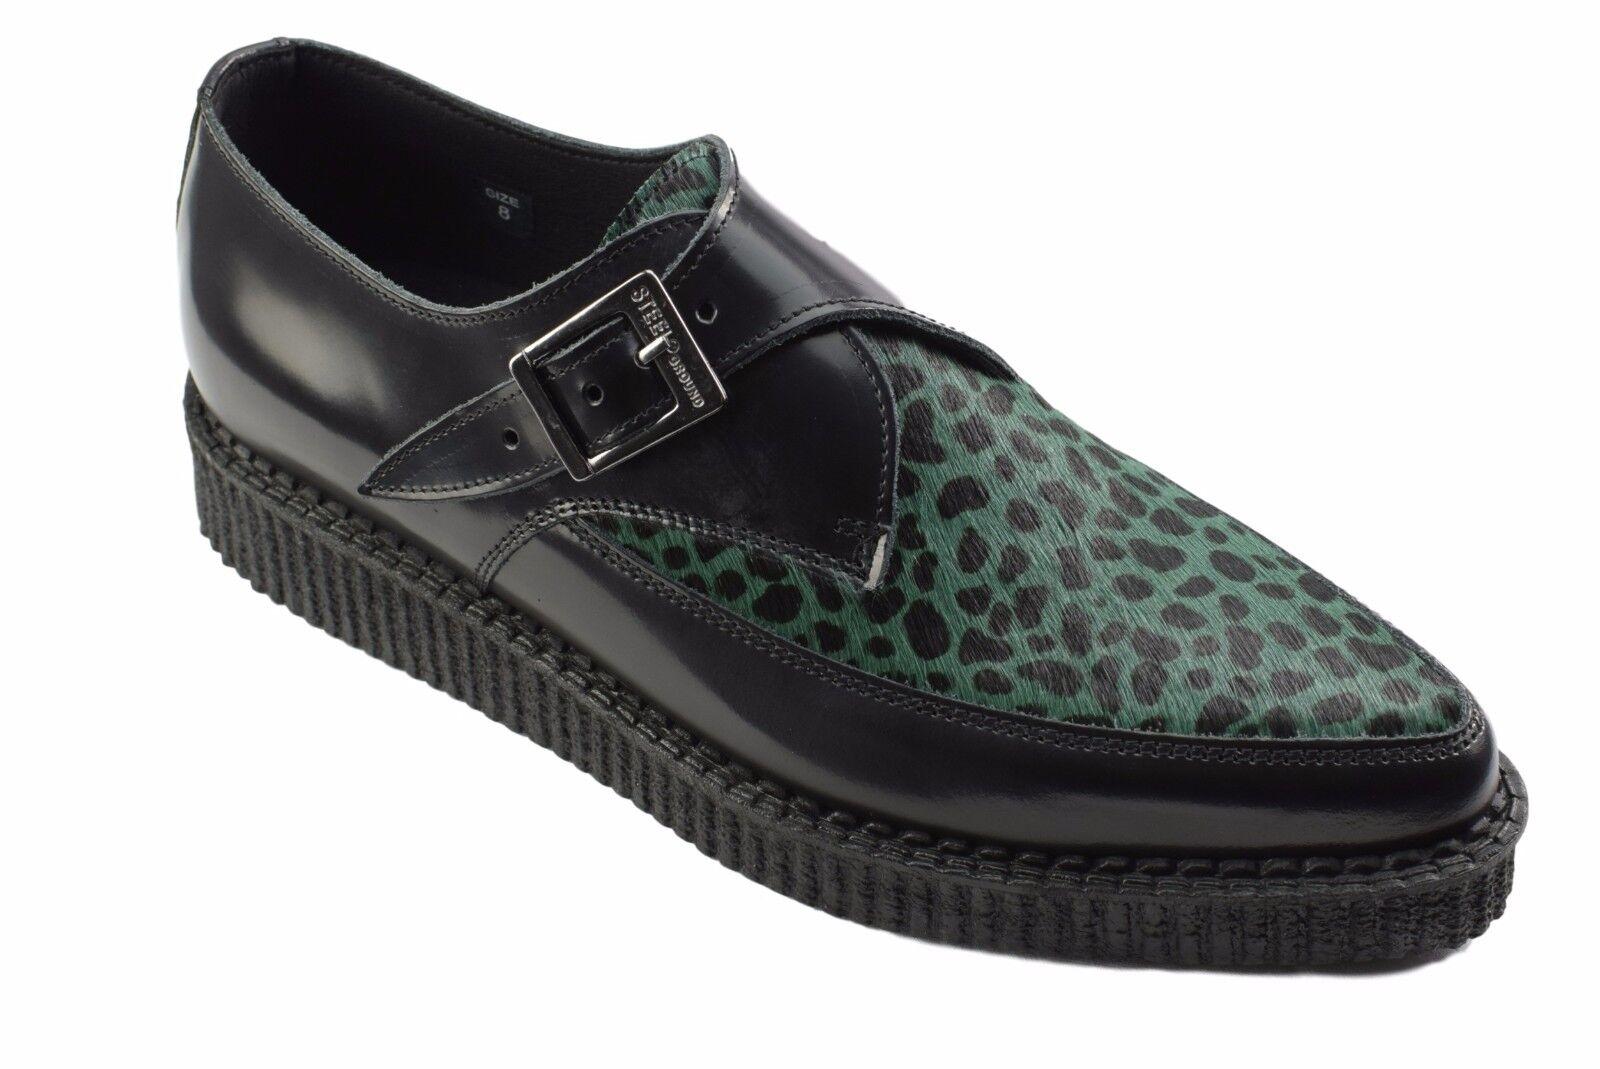 Steel Ground Schuhes schwarz Leder Green Leopard Hair Creepers Monk Buckle Pointed